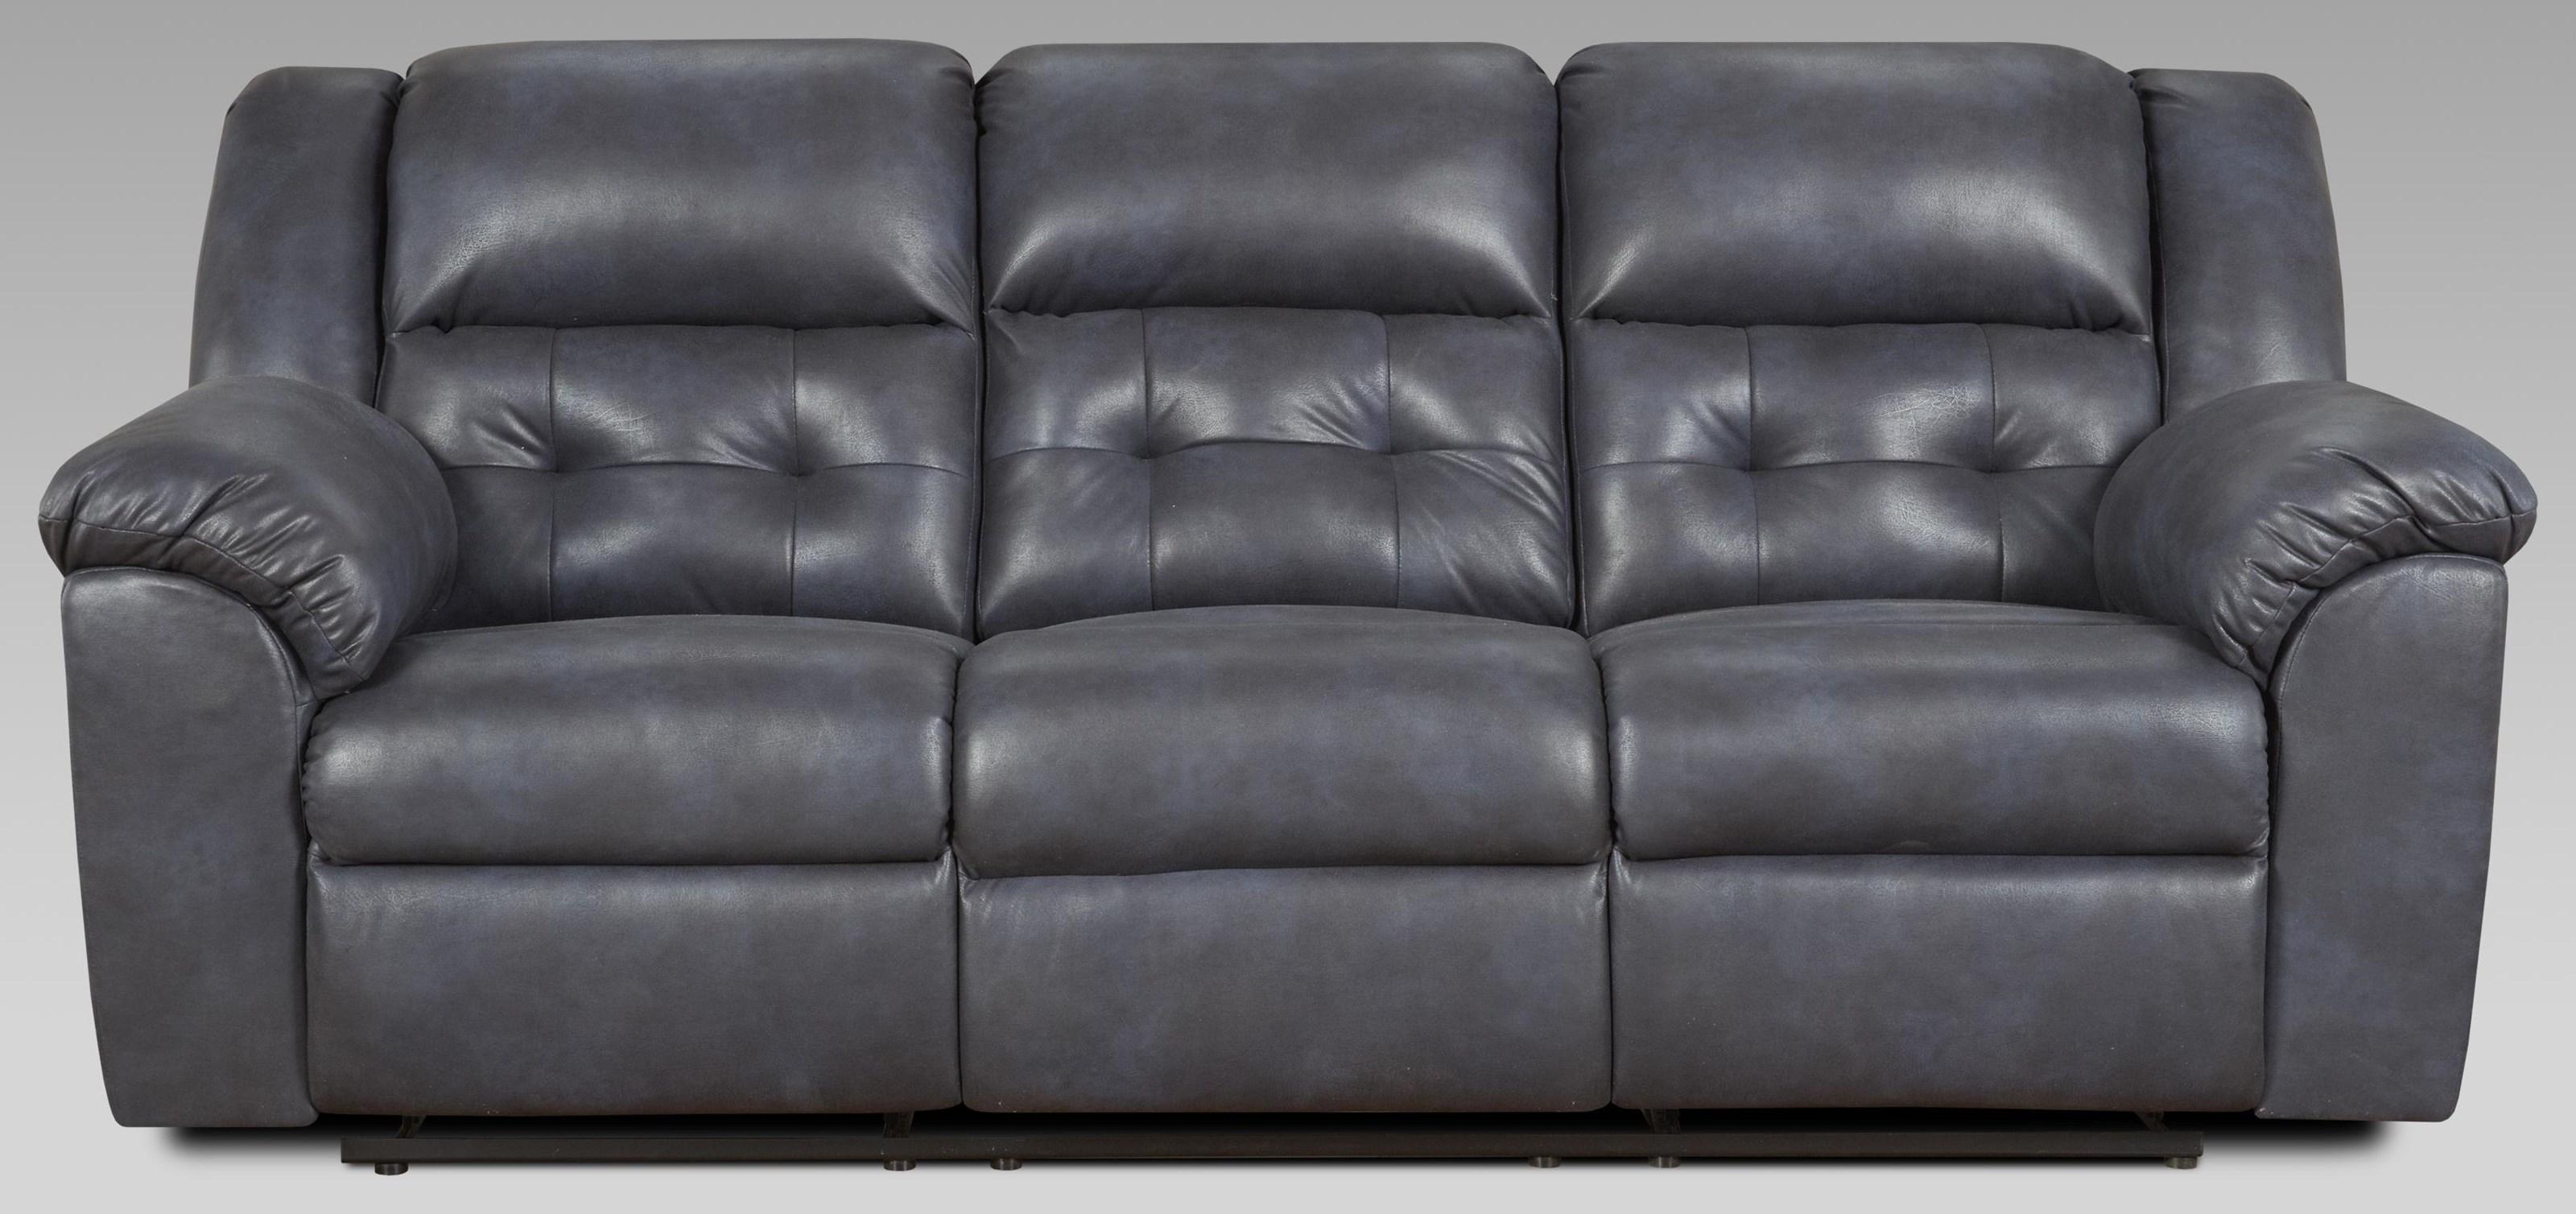 Dual Recloining Sofa